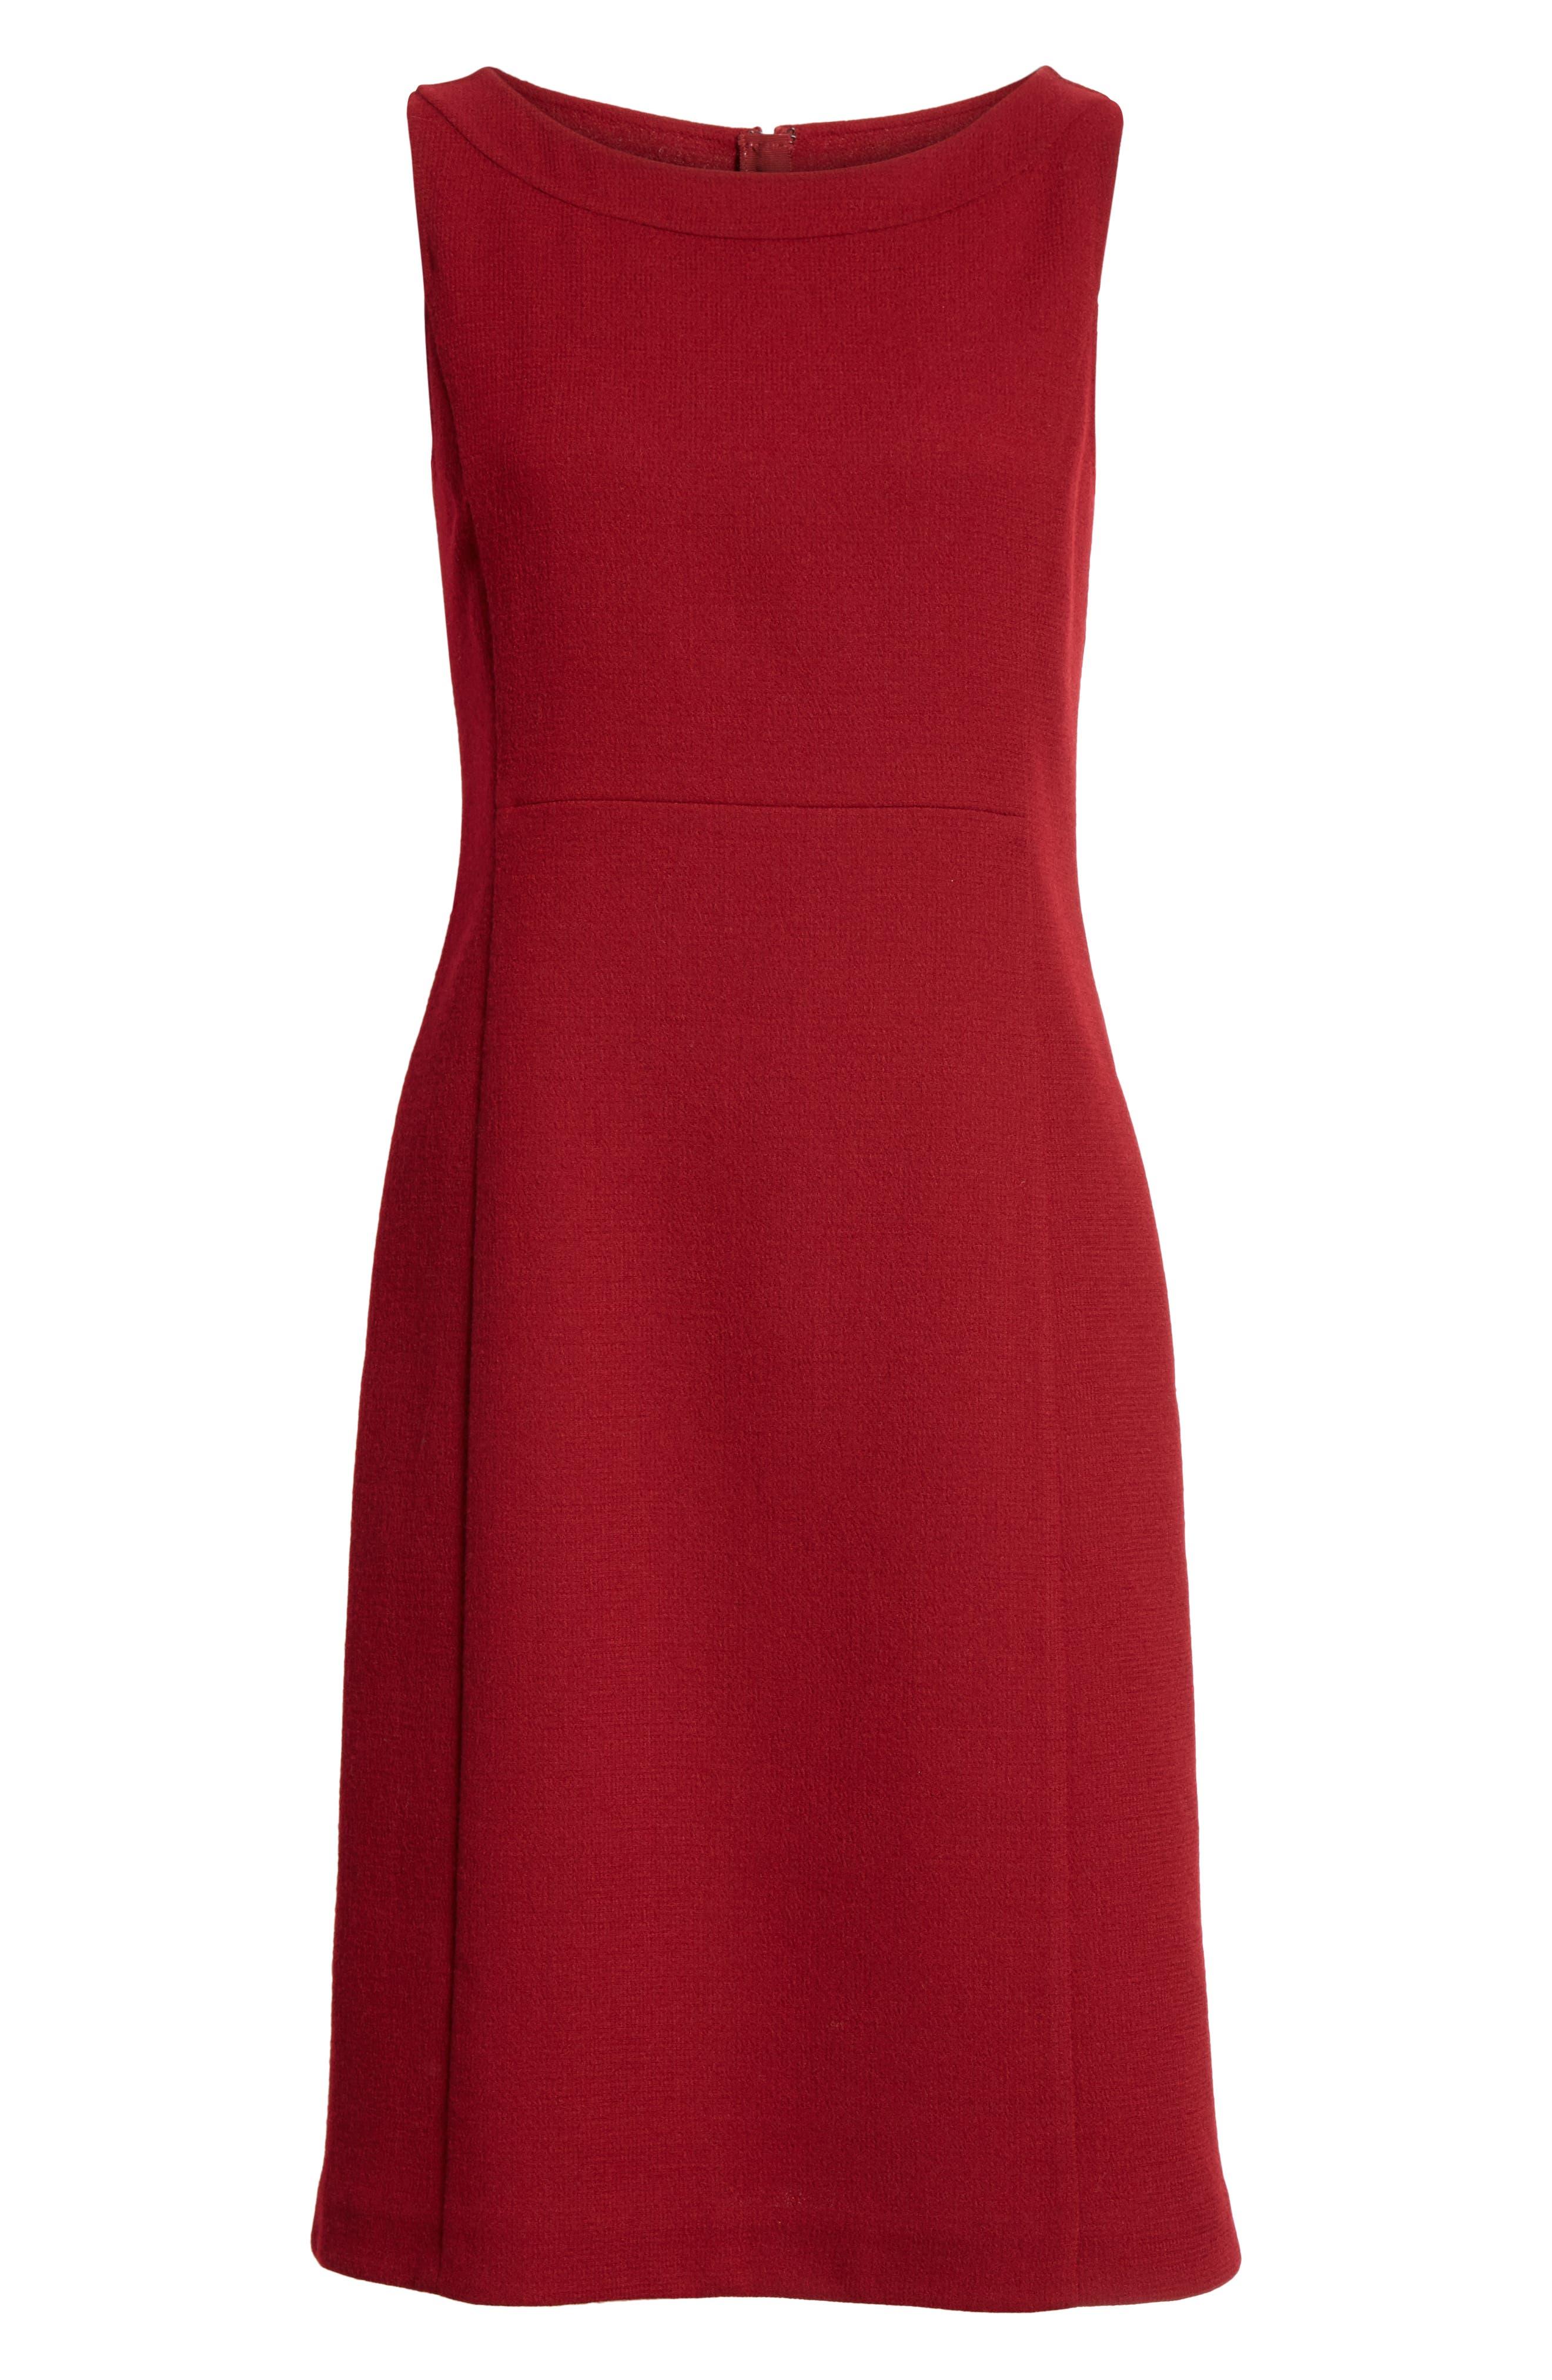 Paxton Sheath Dress,                             Alternate thumbnail 7, color,                             SCARLET